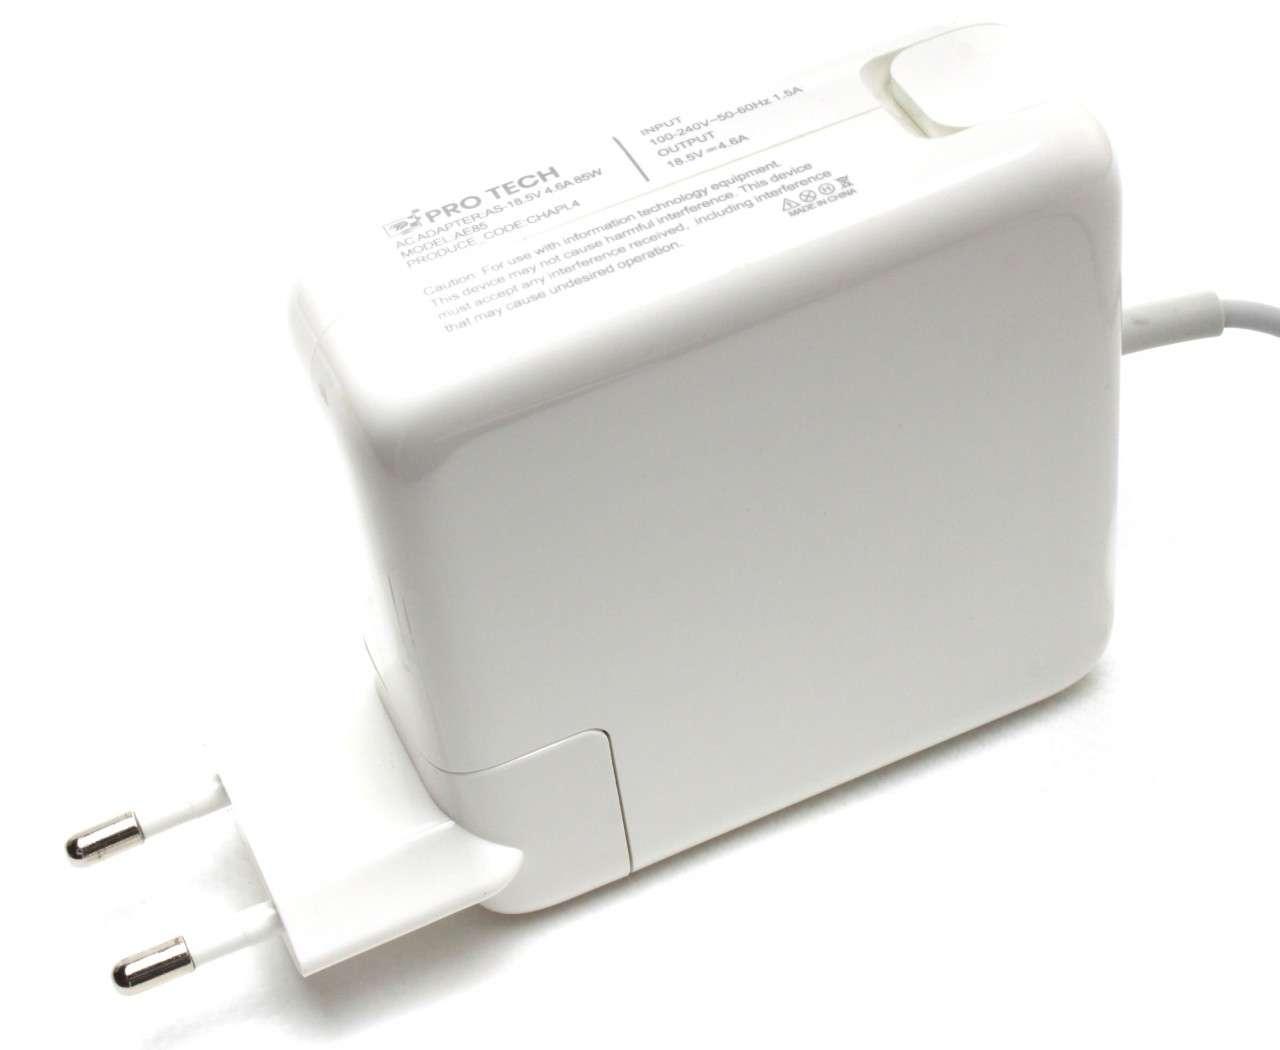 Incarcator Apple MagSafe 85W Replacement imagine powerlaptop.ro 2021